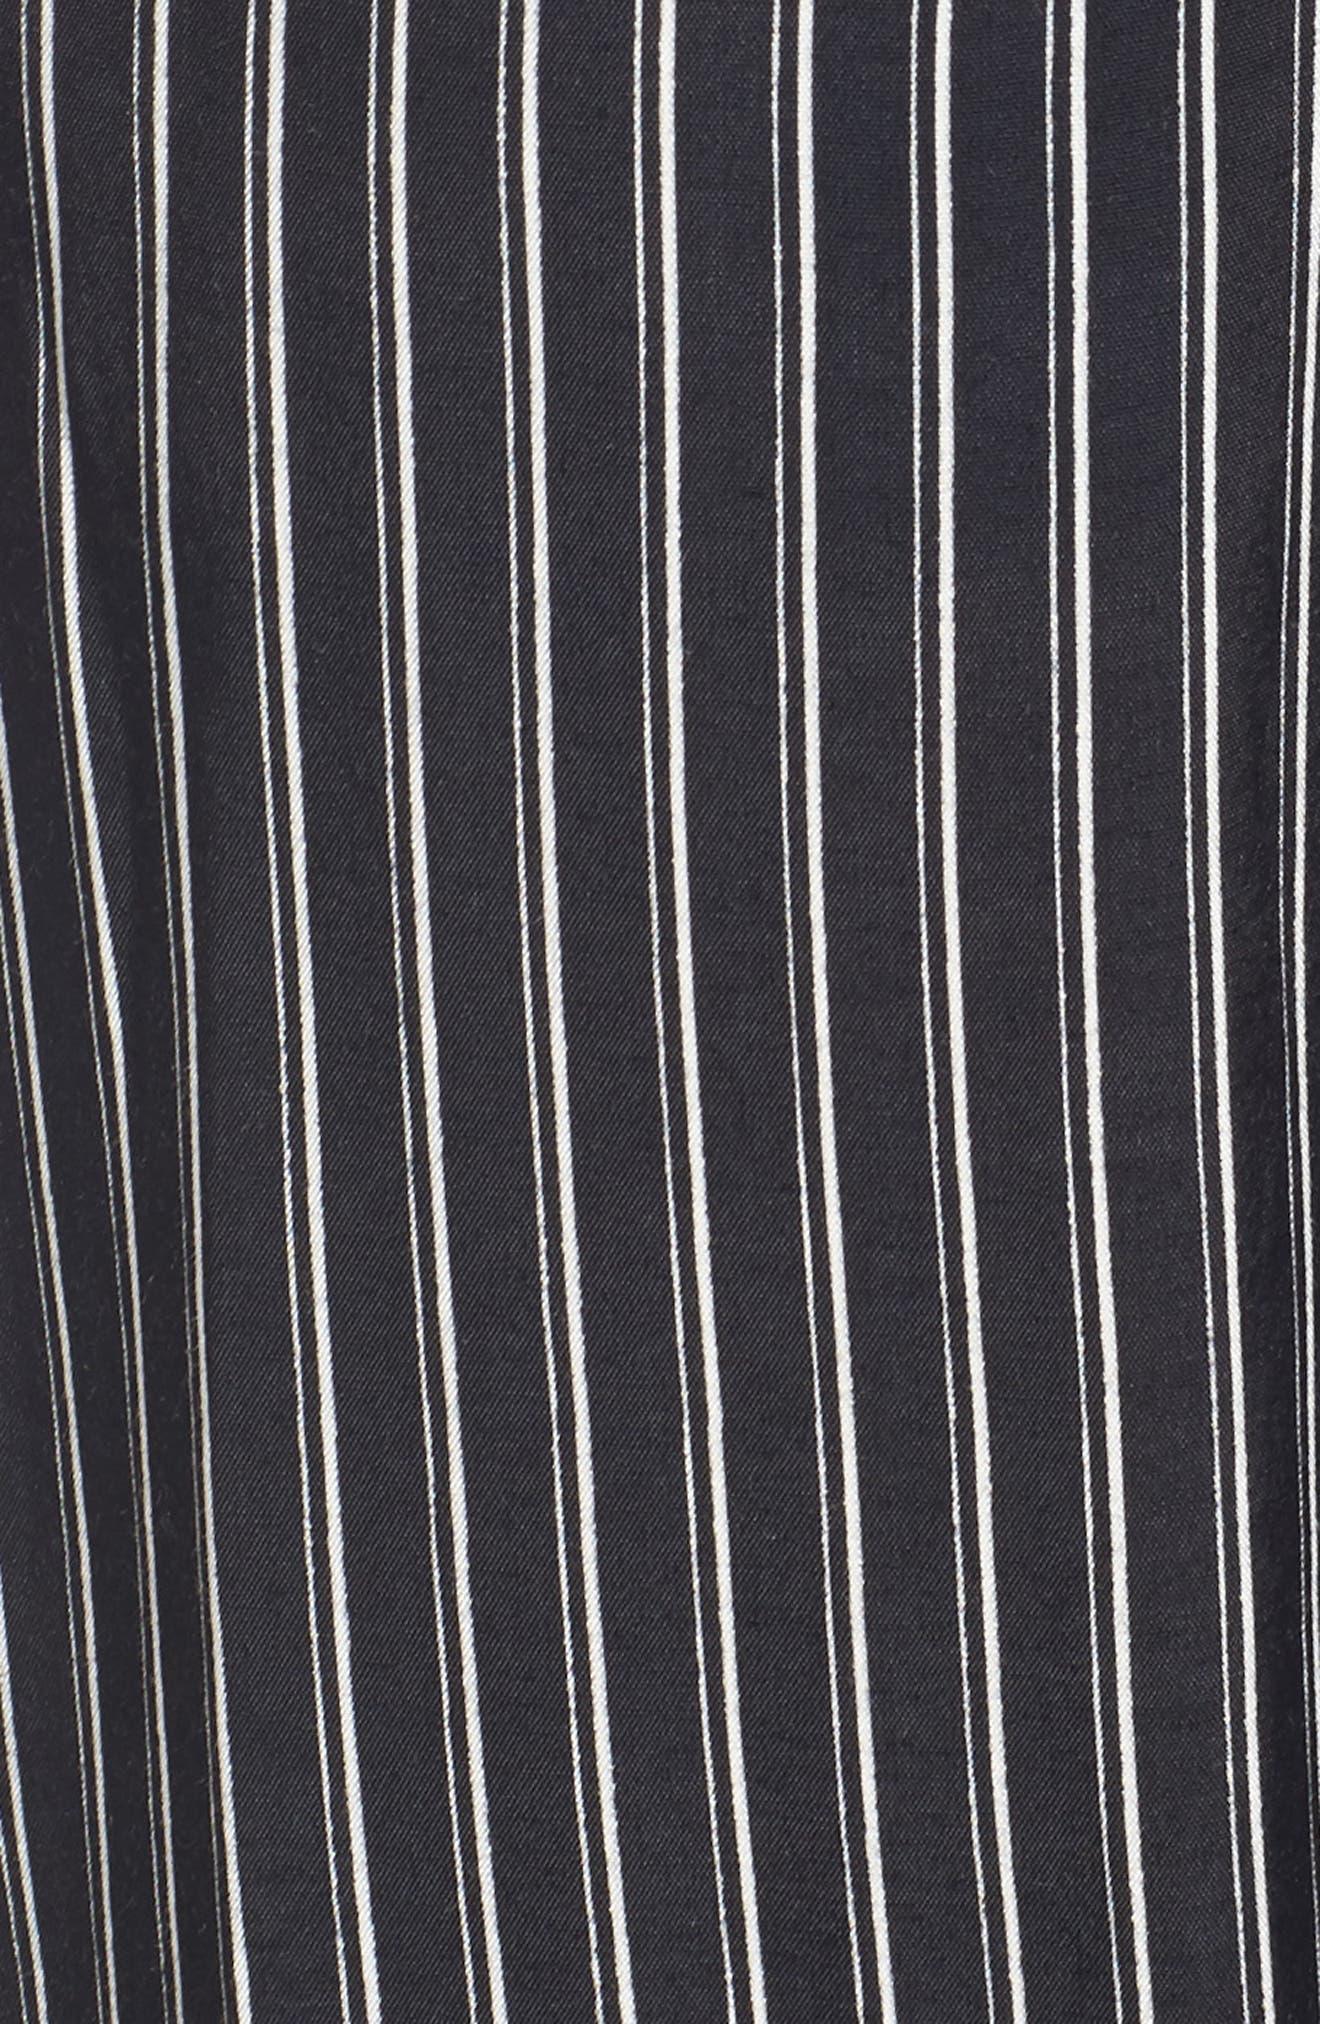 Cedric Plunging Pinstripe Jumpsuit,                             Alternate thumbnail 5, color,                             001